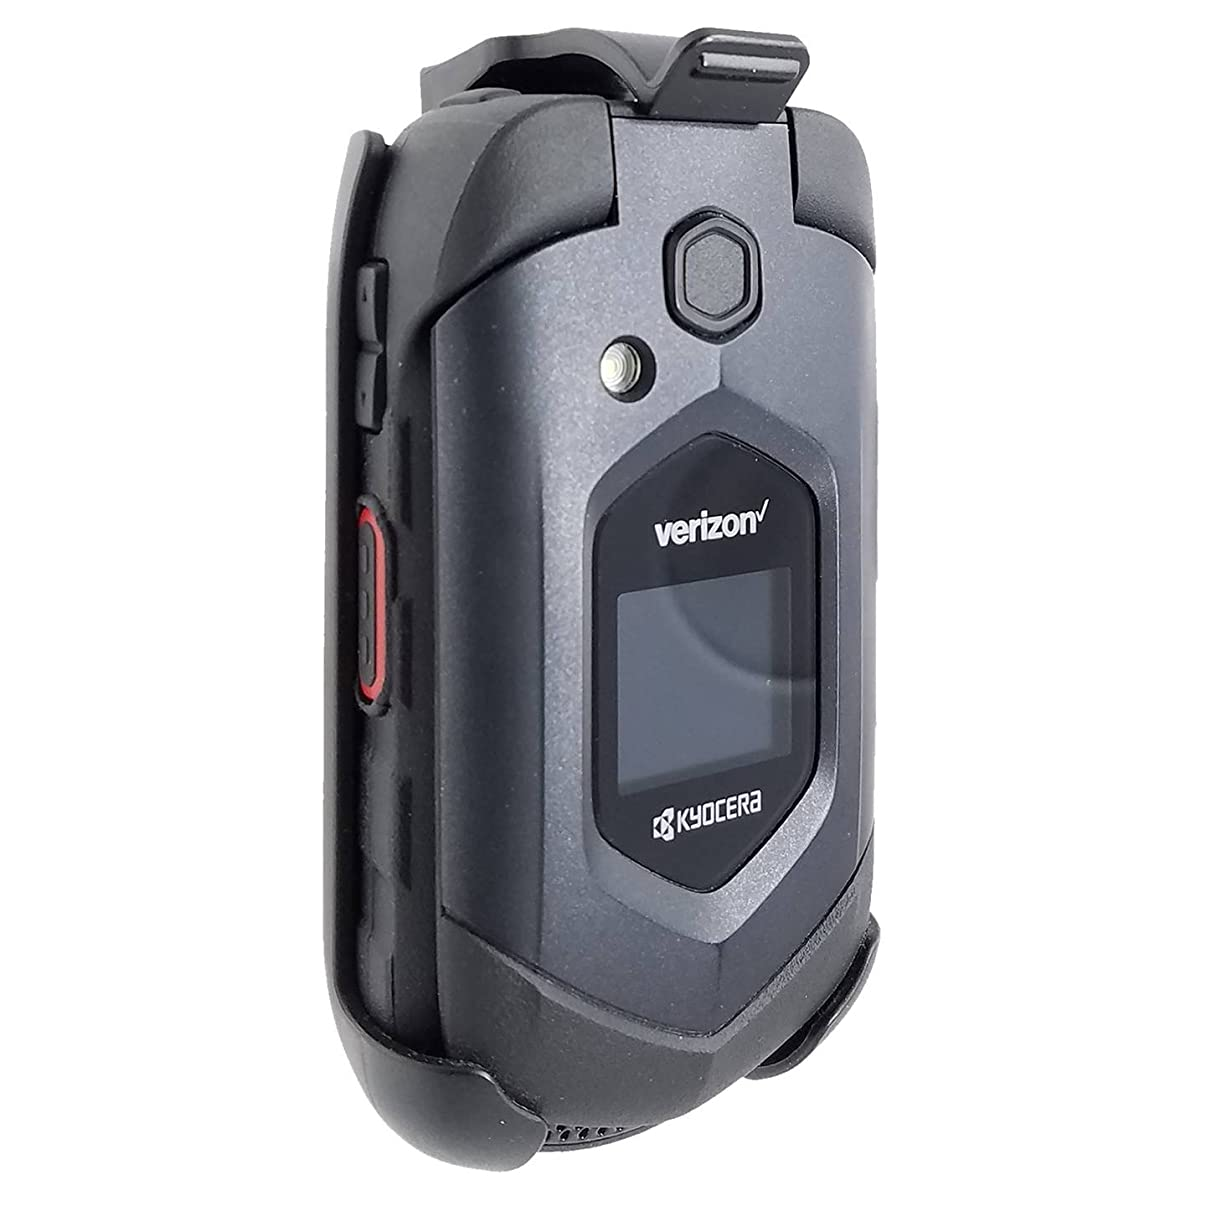 Kyocera DuraXV Plus XV + E4520 Belt Clip Holster Black (LEIF)